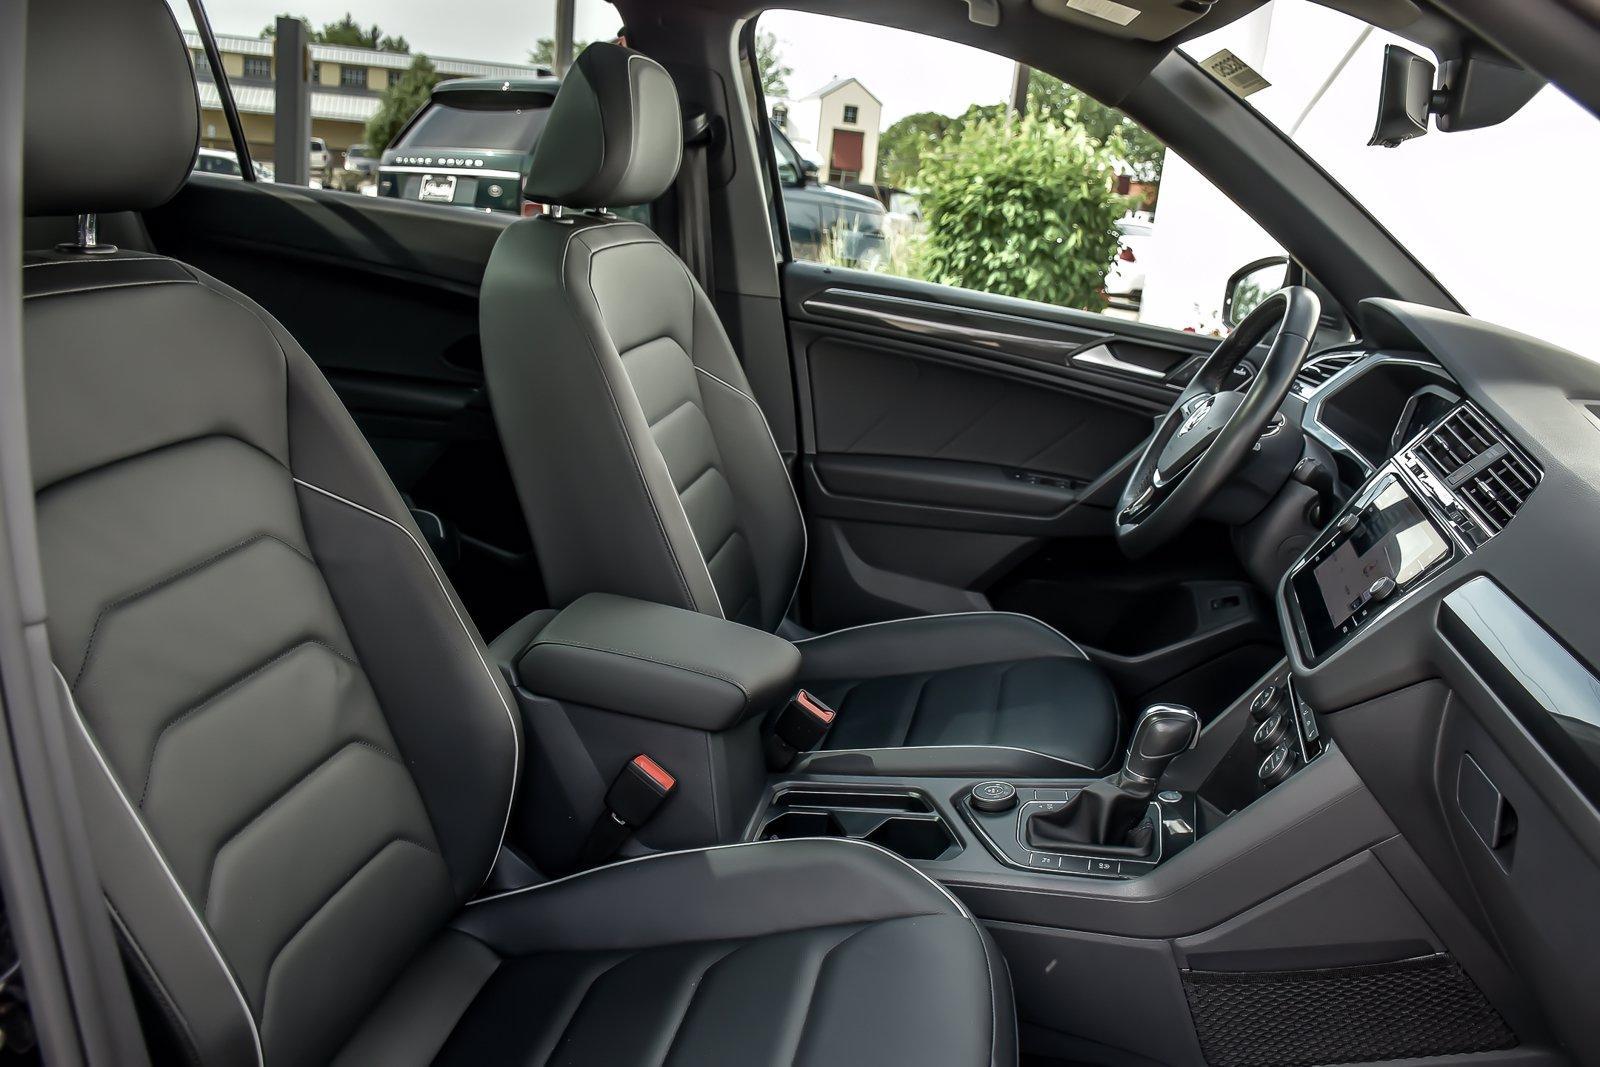 Used 2019 Volkswagen Tiguan SEL Premium R-Line | Downers Grove, IL